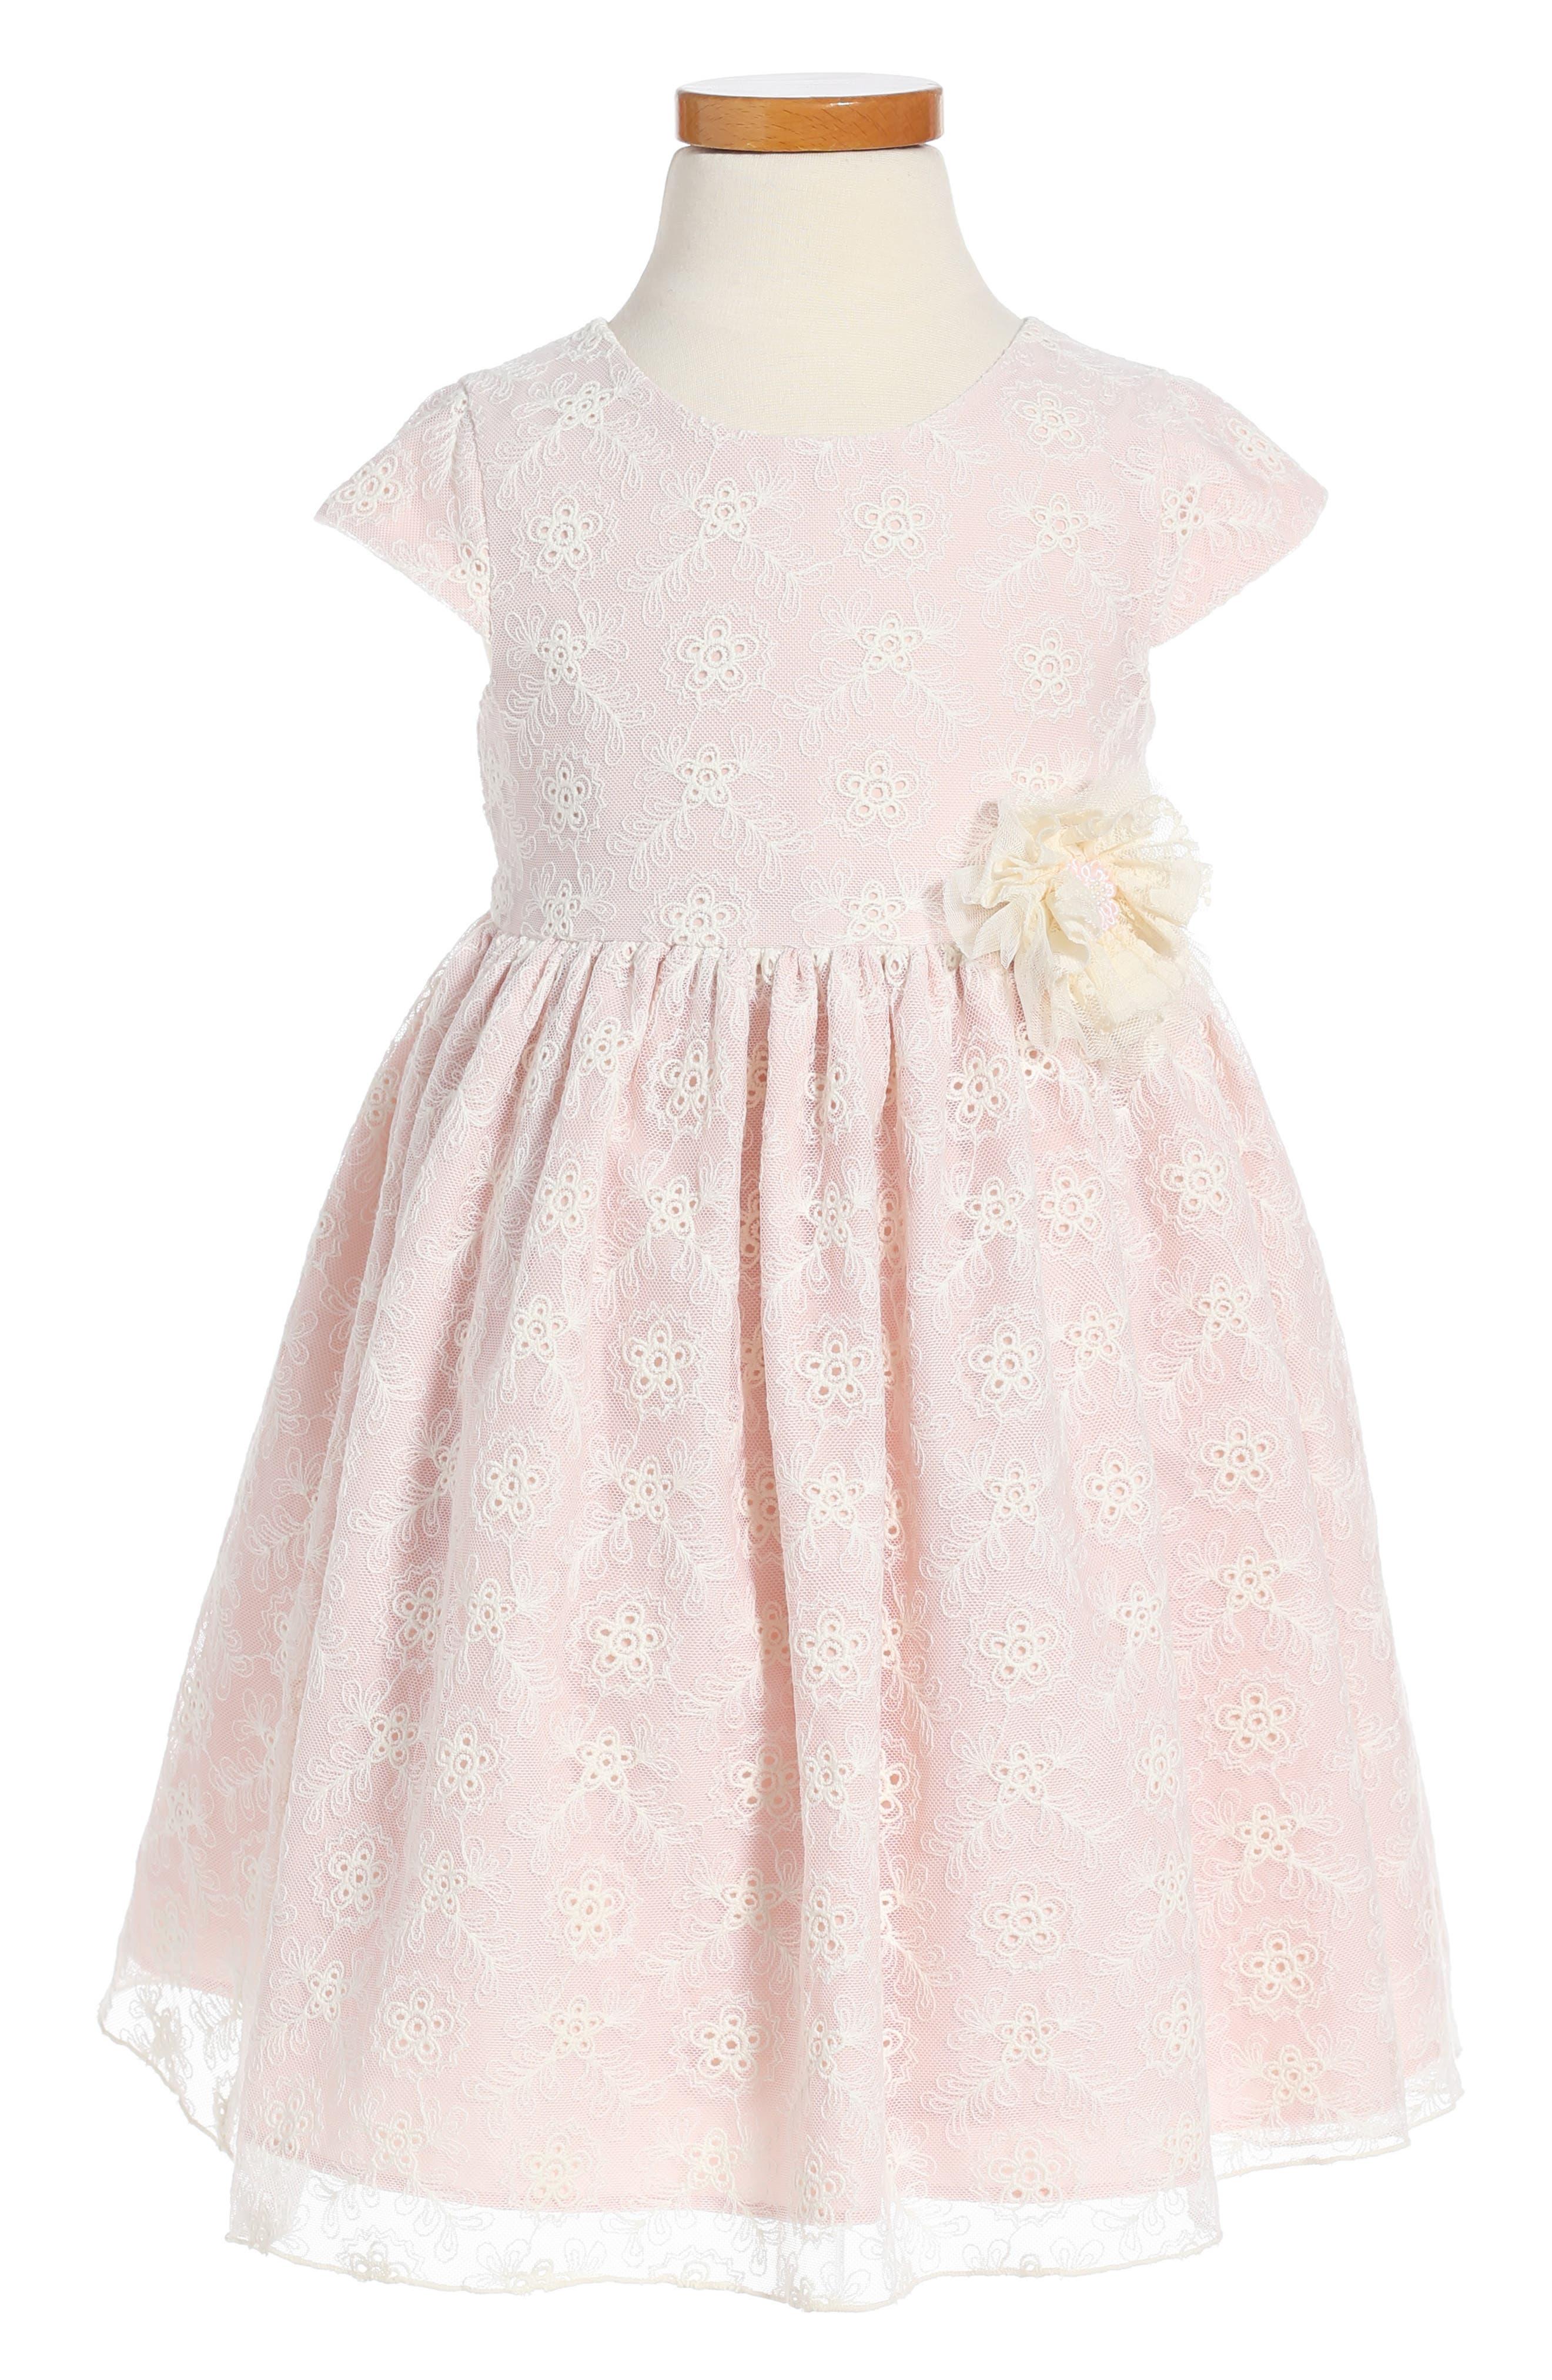 Main Image - Pippa & Julie Lace Dress (Toddler Girls & Little Girls)